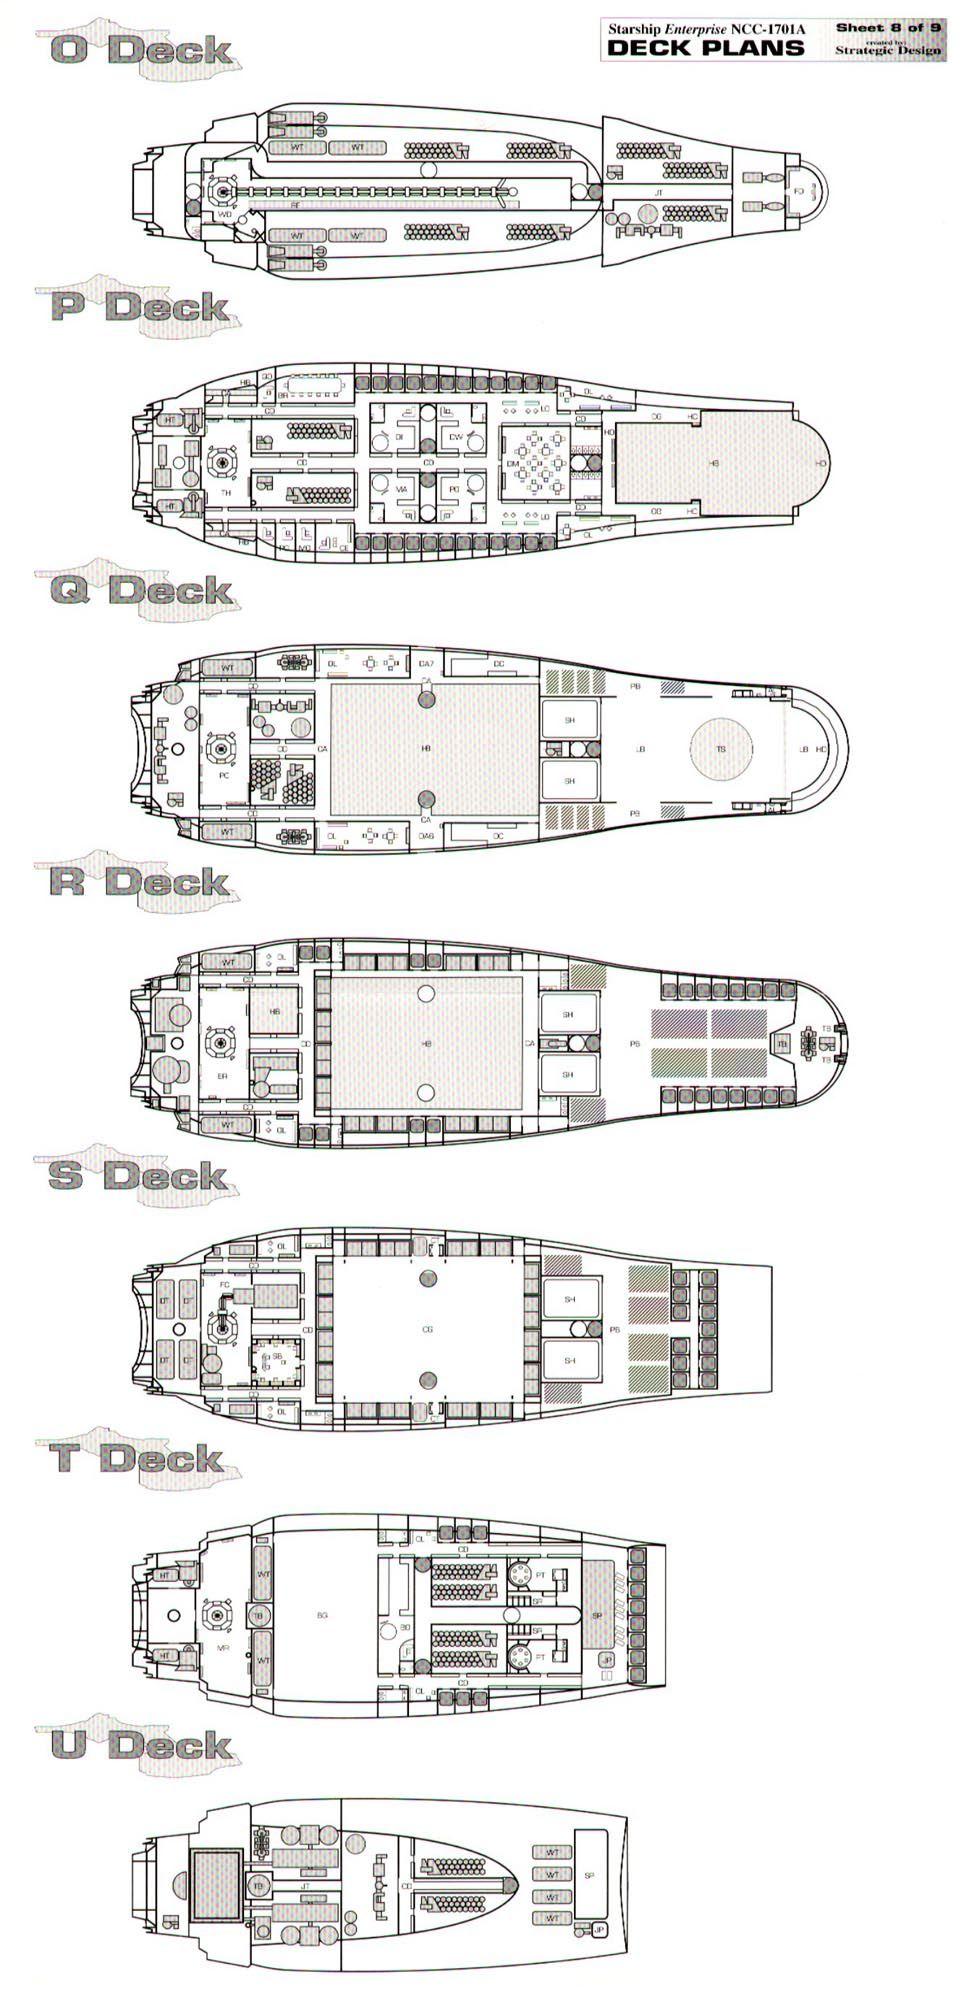 Uss enterprise ncc 1701 d galaxy class saucer separation r flickr - U S S Enterprise Ncc 1701 A Decks O U